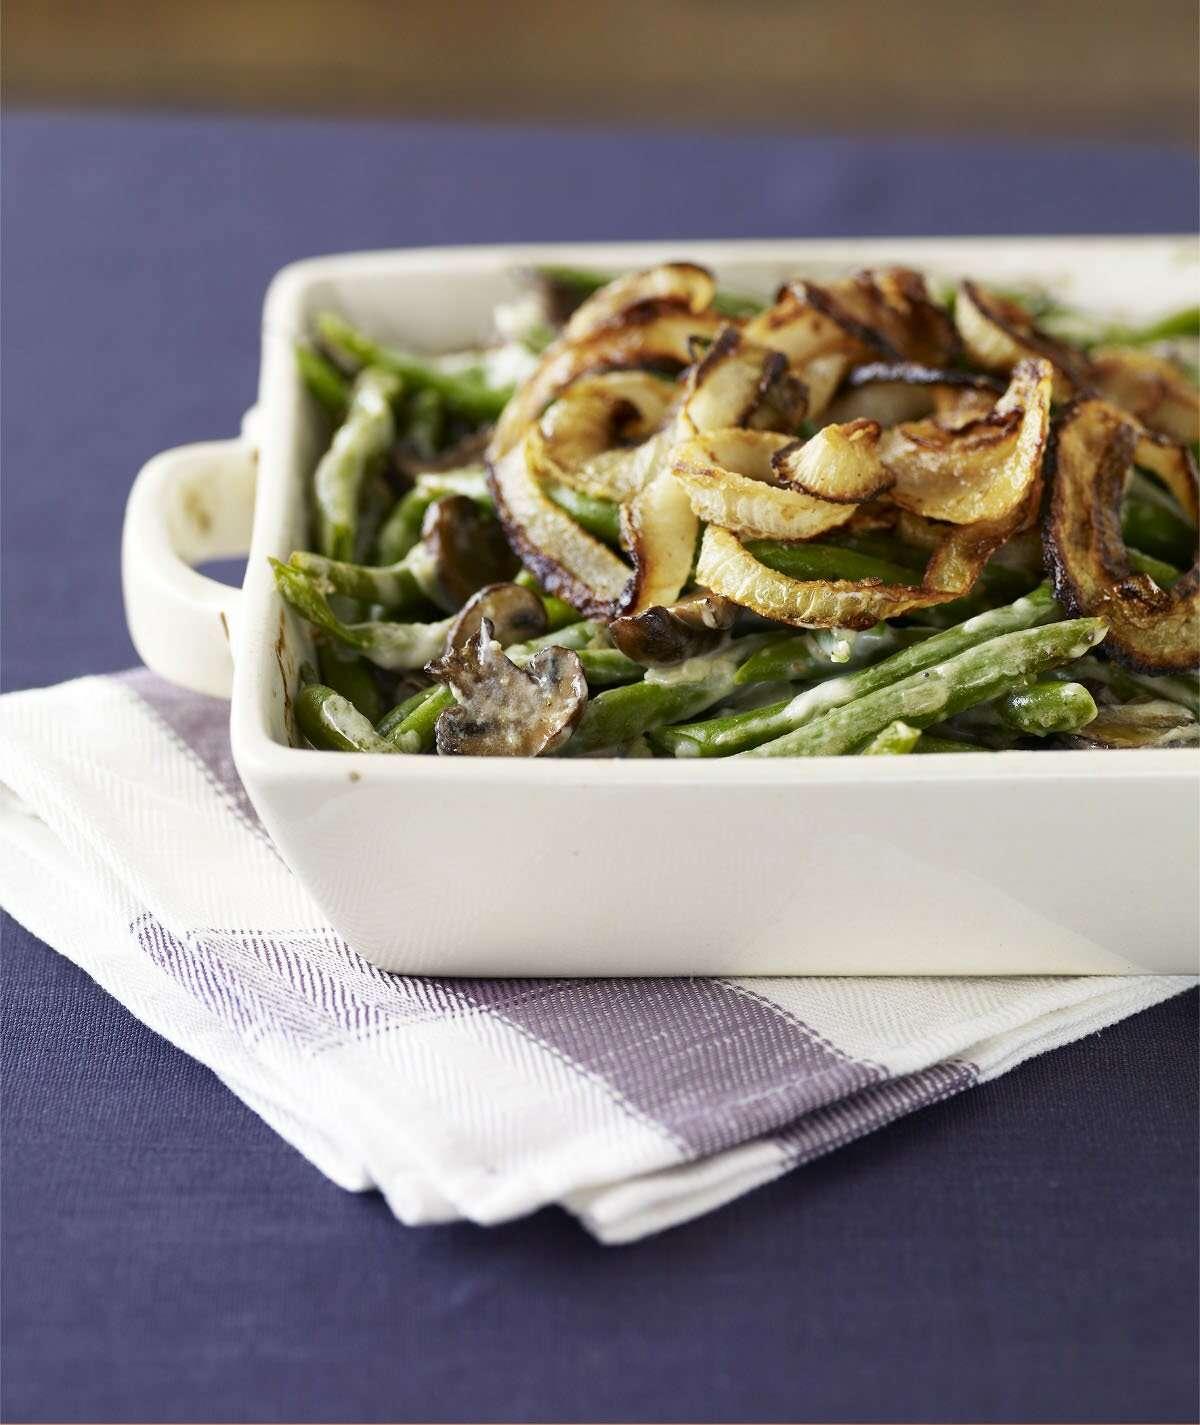 green bean casserole originally published November 2009